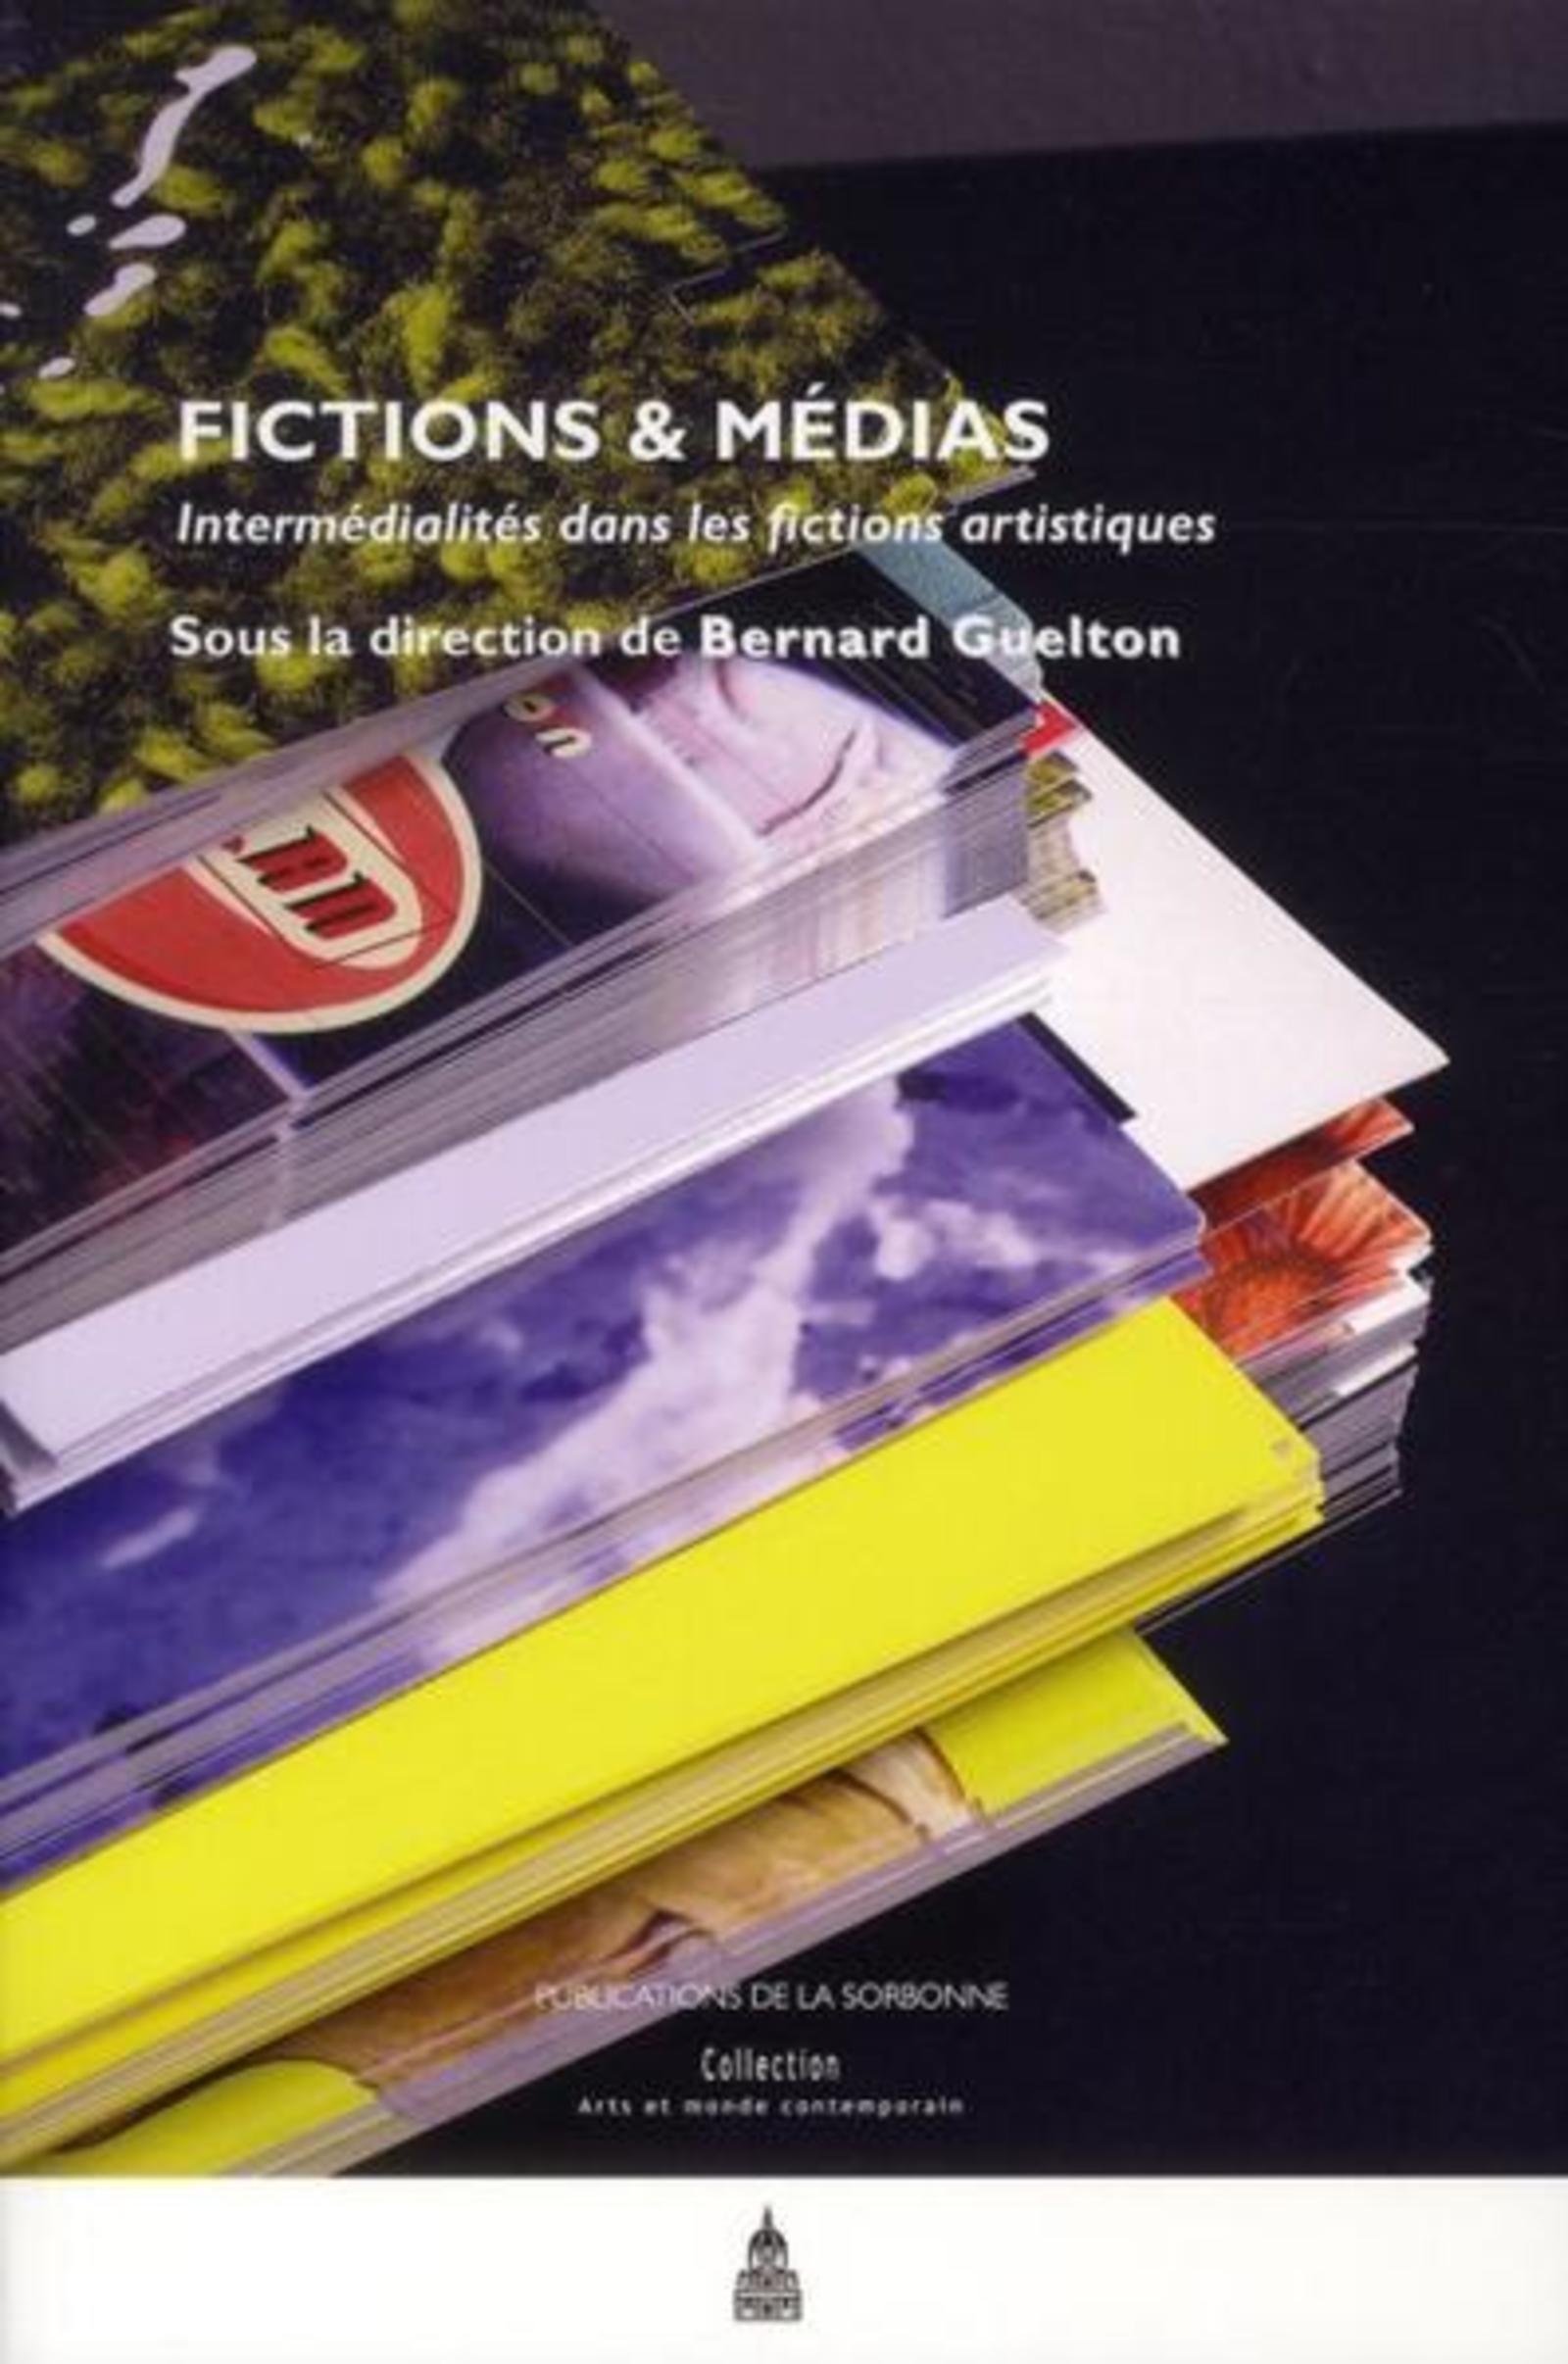 FICTIONS & MEDIAS INTERMEDIALITES DANS LES FICTIONS ARTISTIQUES